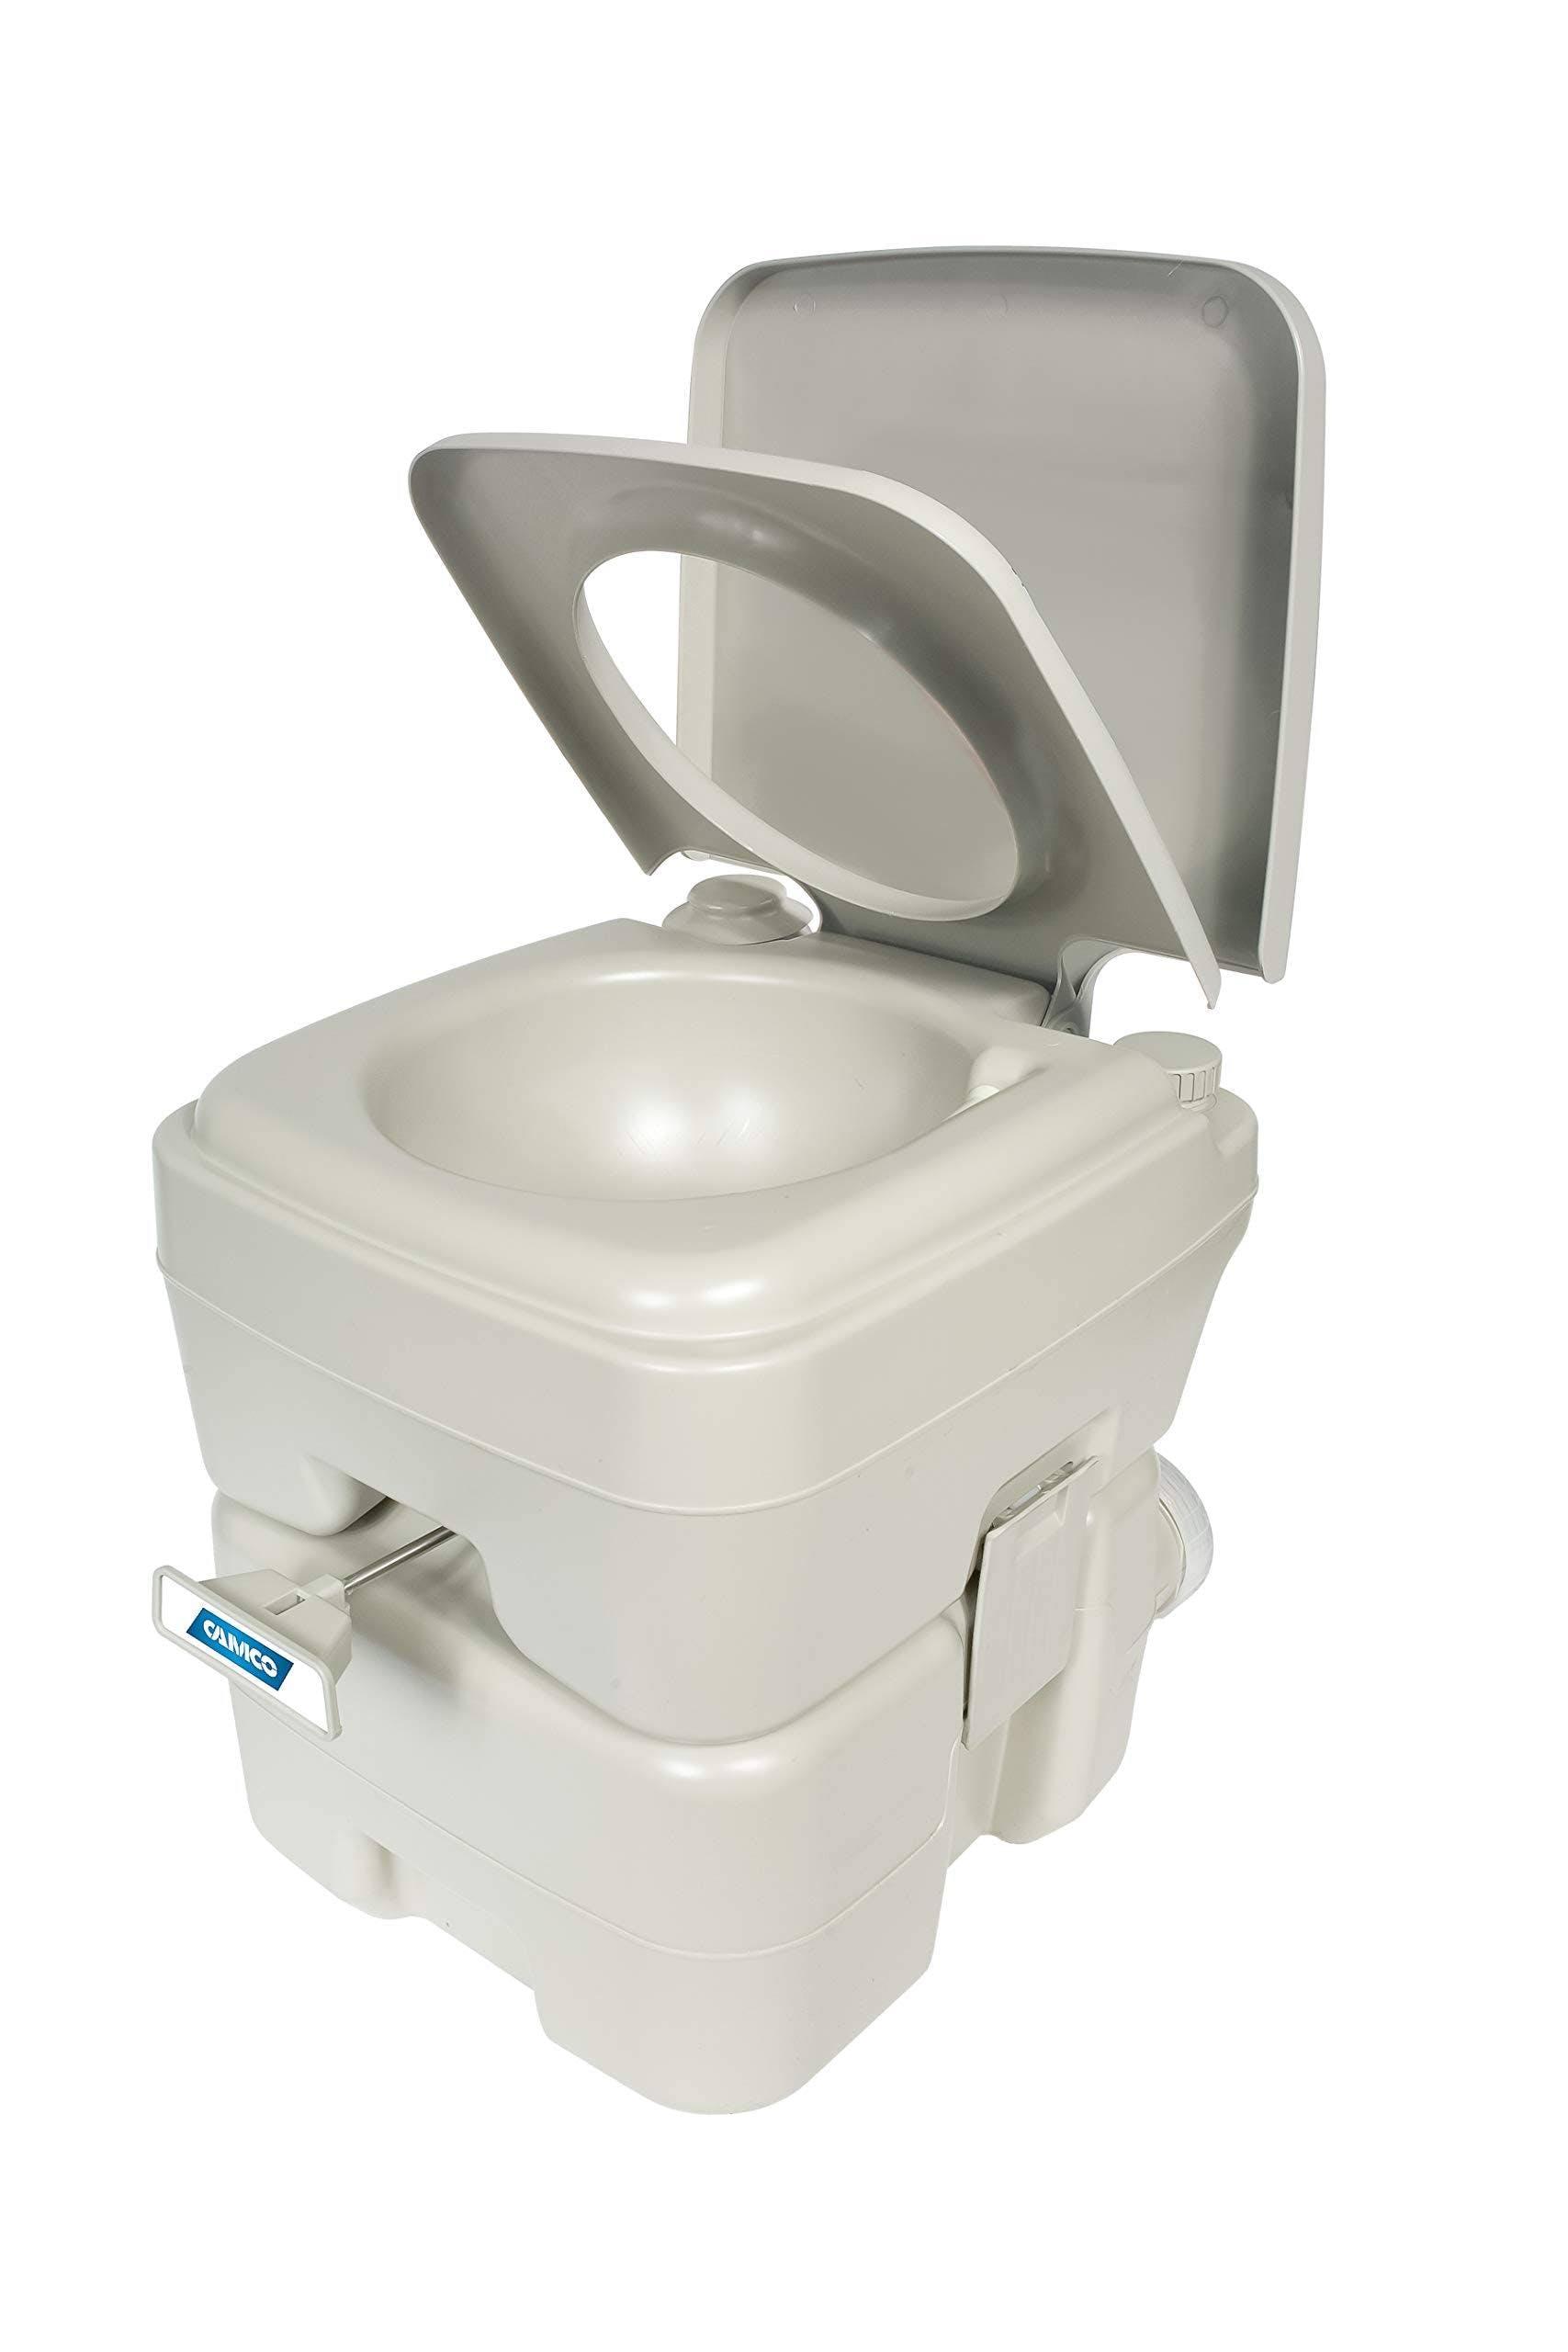 Camco - Portable Toilet 5.3 Gal